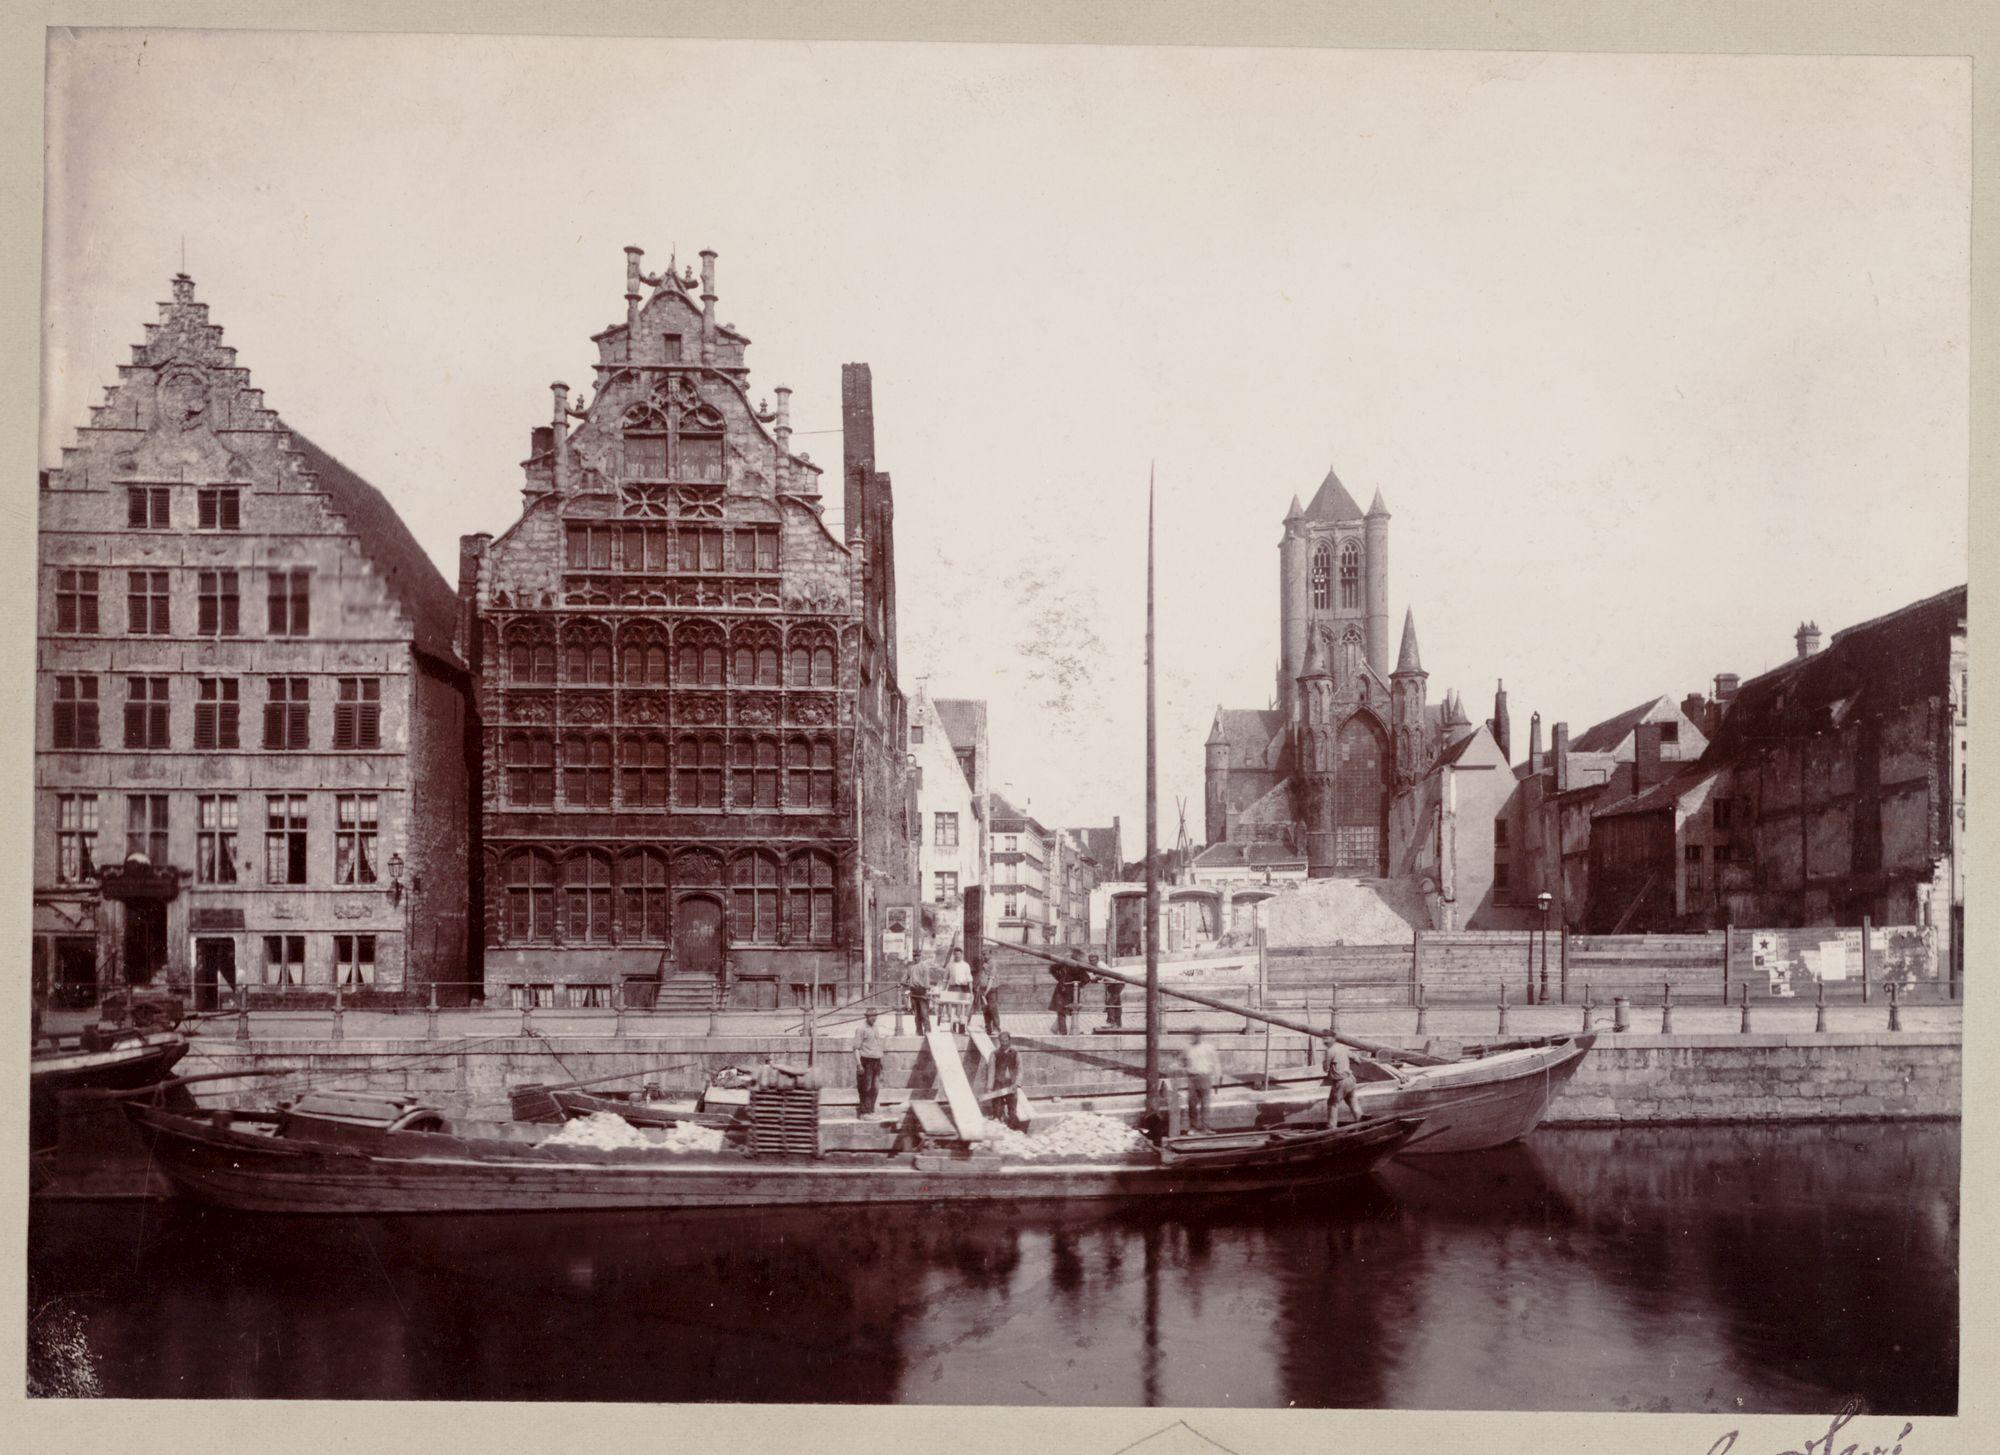 Gent: Afbraak van het Pakhuis, Graslei